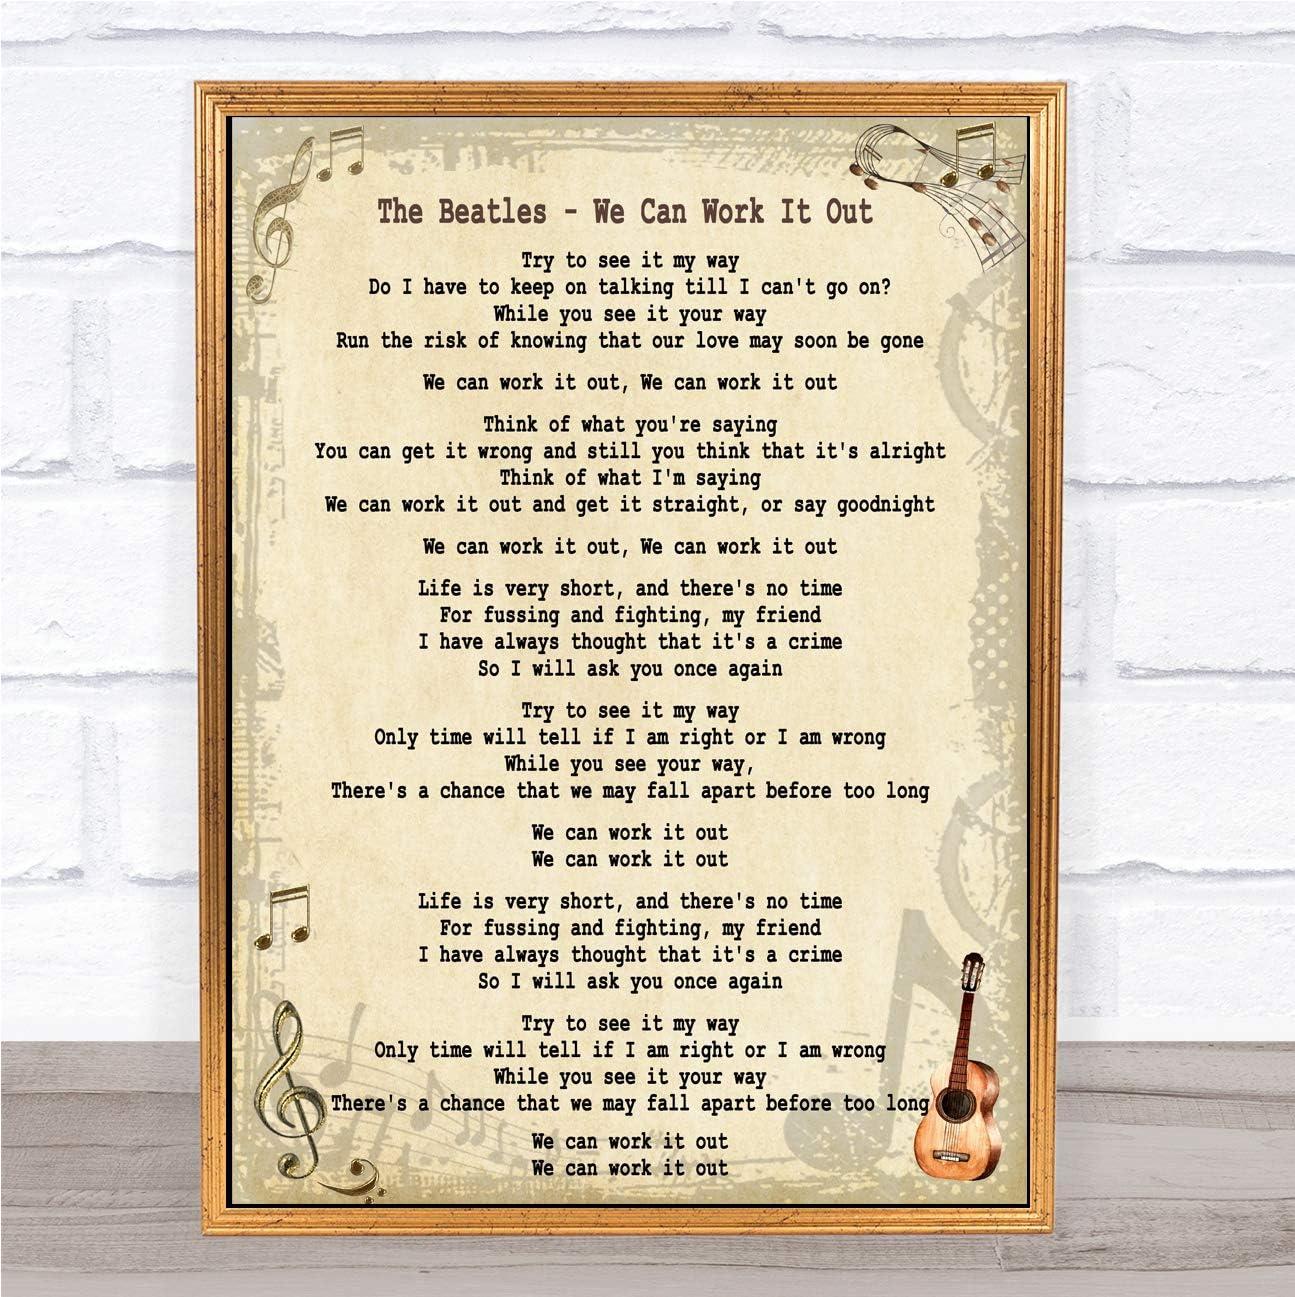 We Can Work It Out Beatles Lyrics - Photos Idea